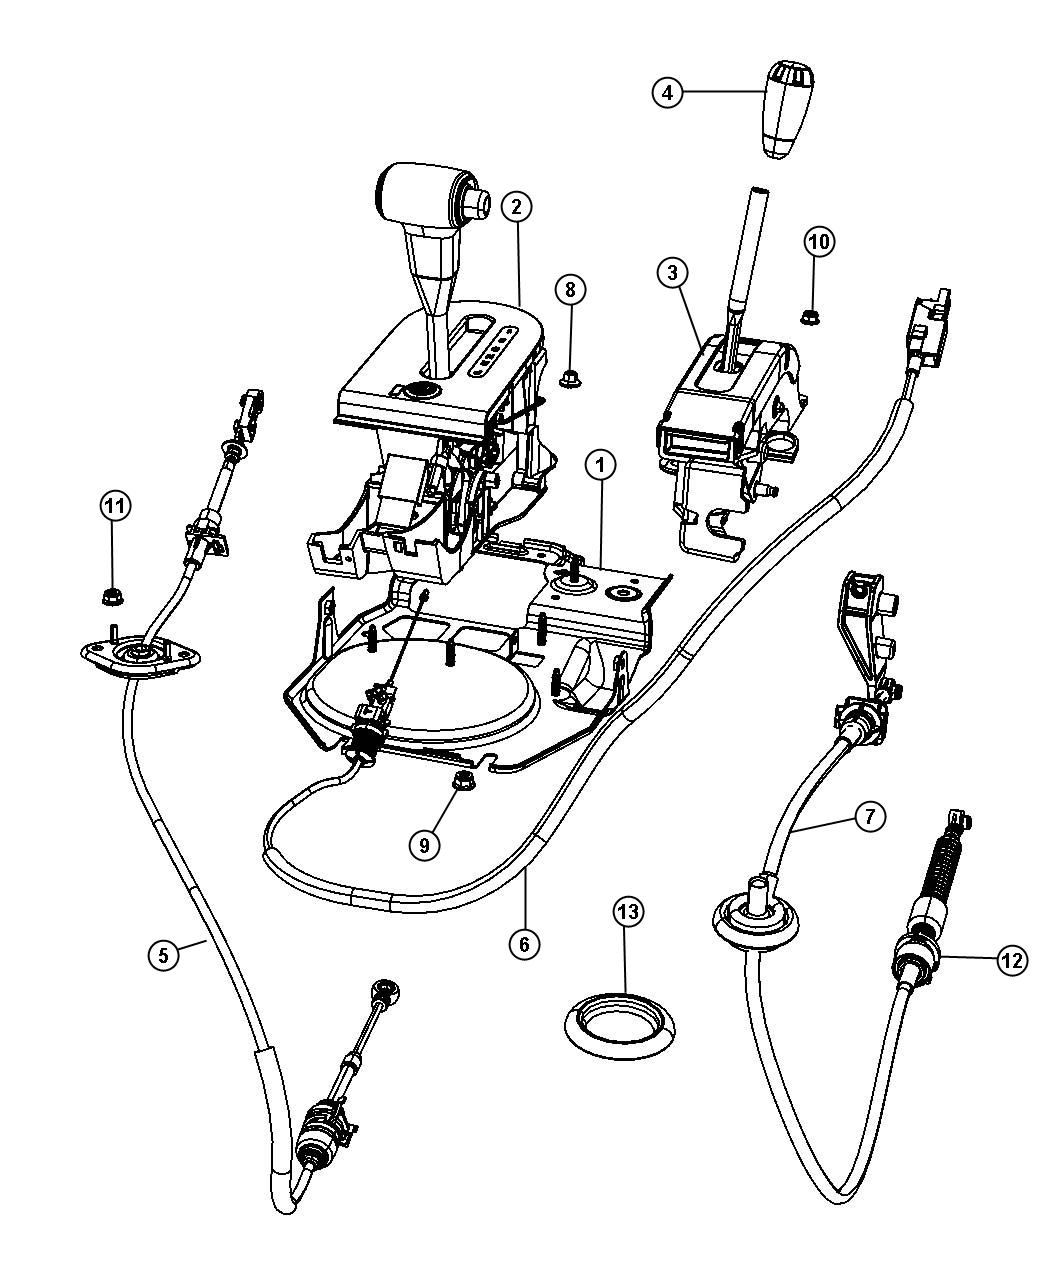 2010 Jeep Wrangler Cable. Brake interlock, ignition key